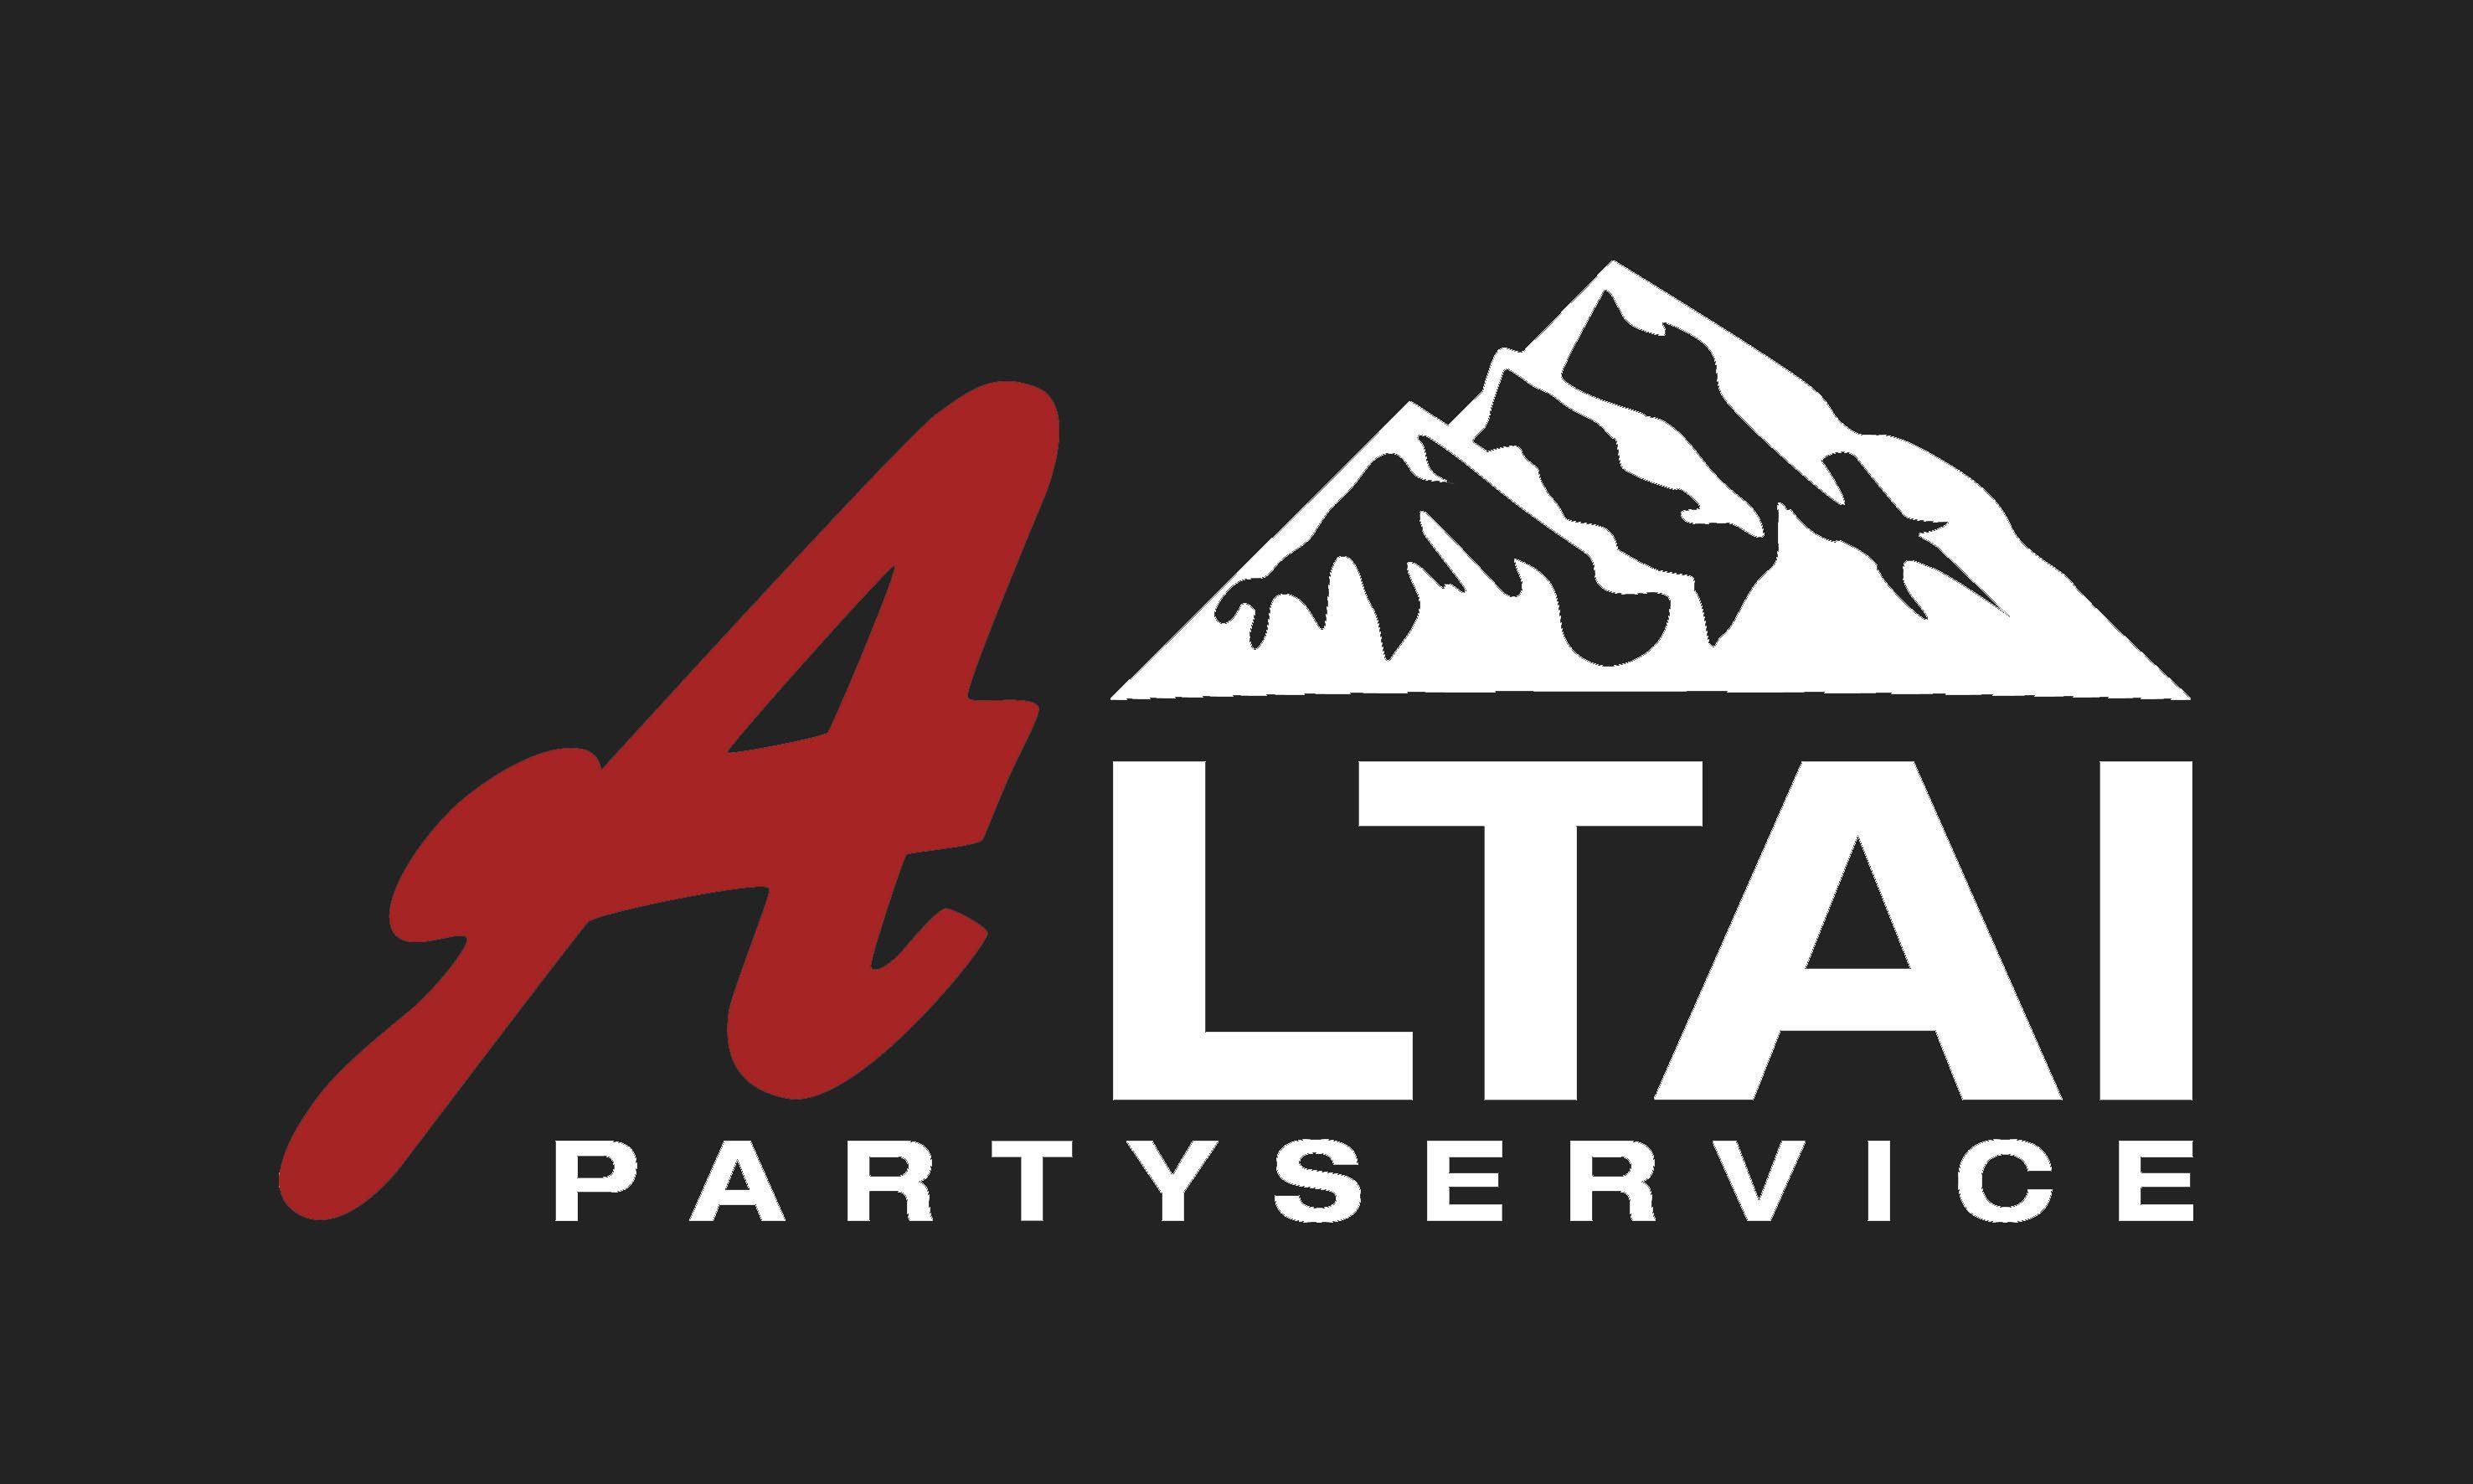 Altai Partyservice logo